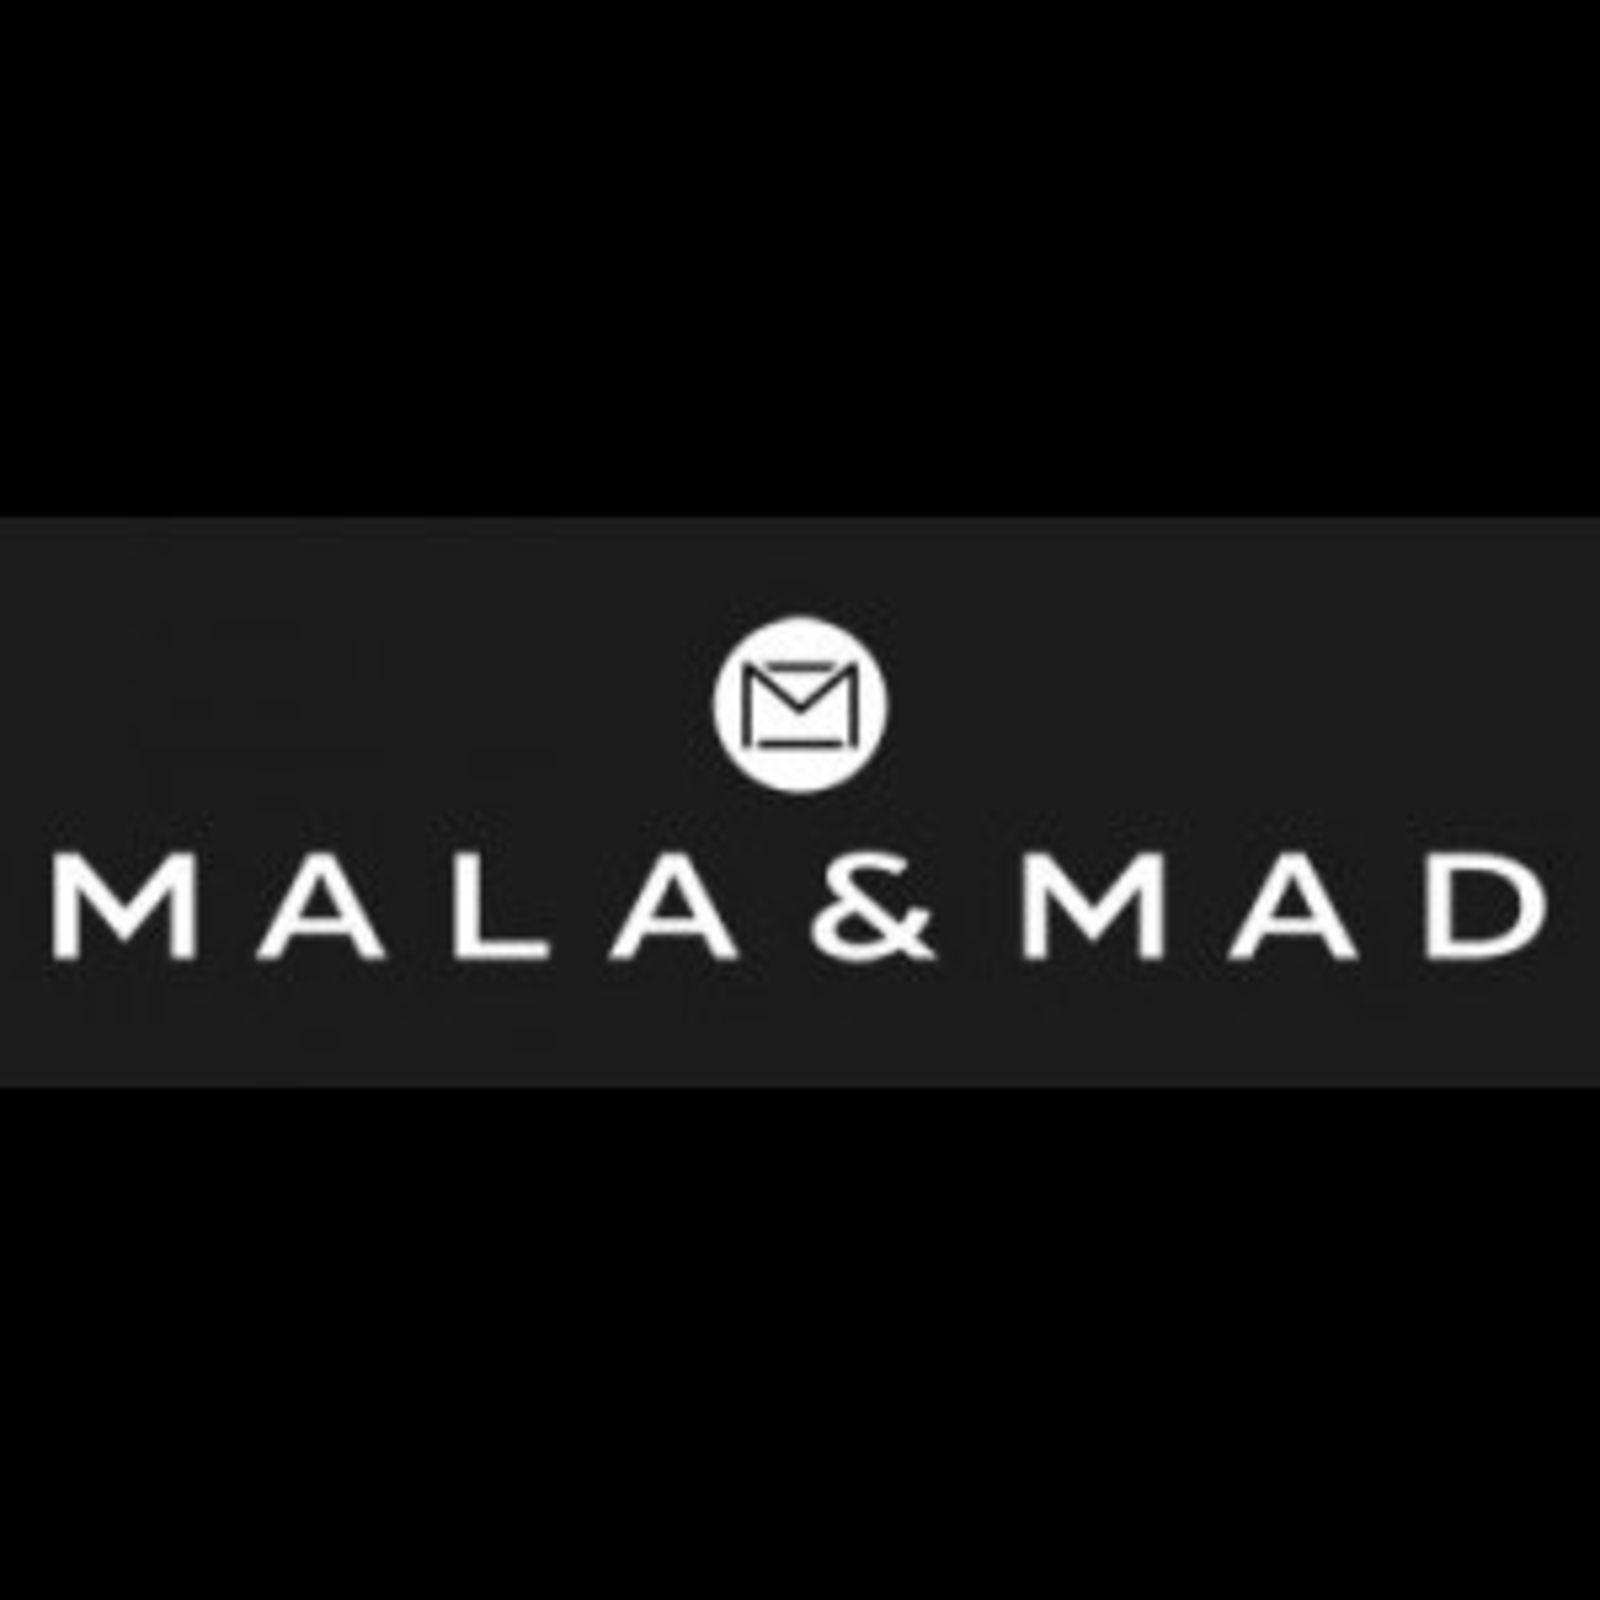 MALA & MAD